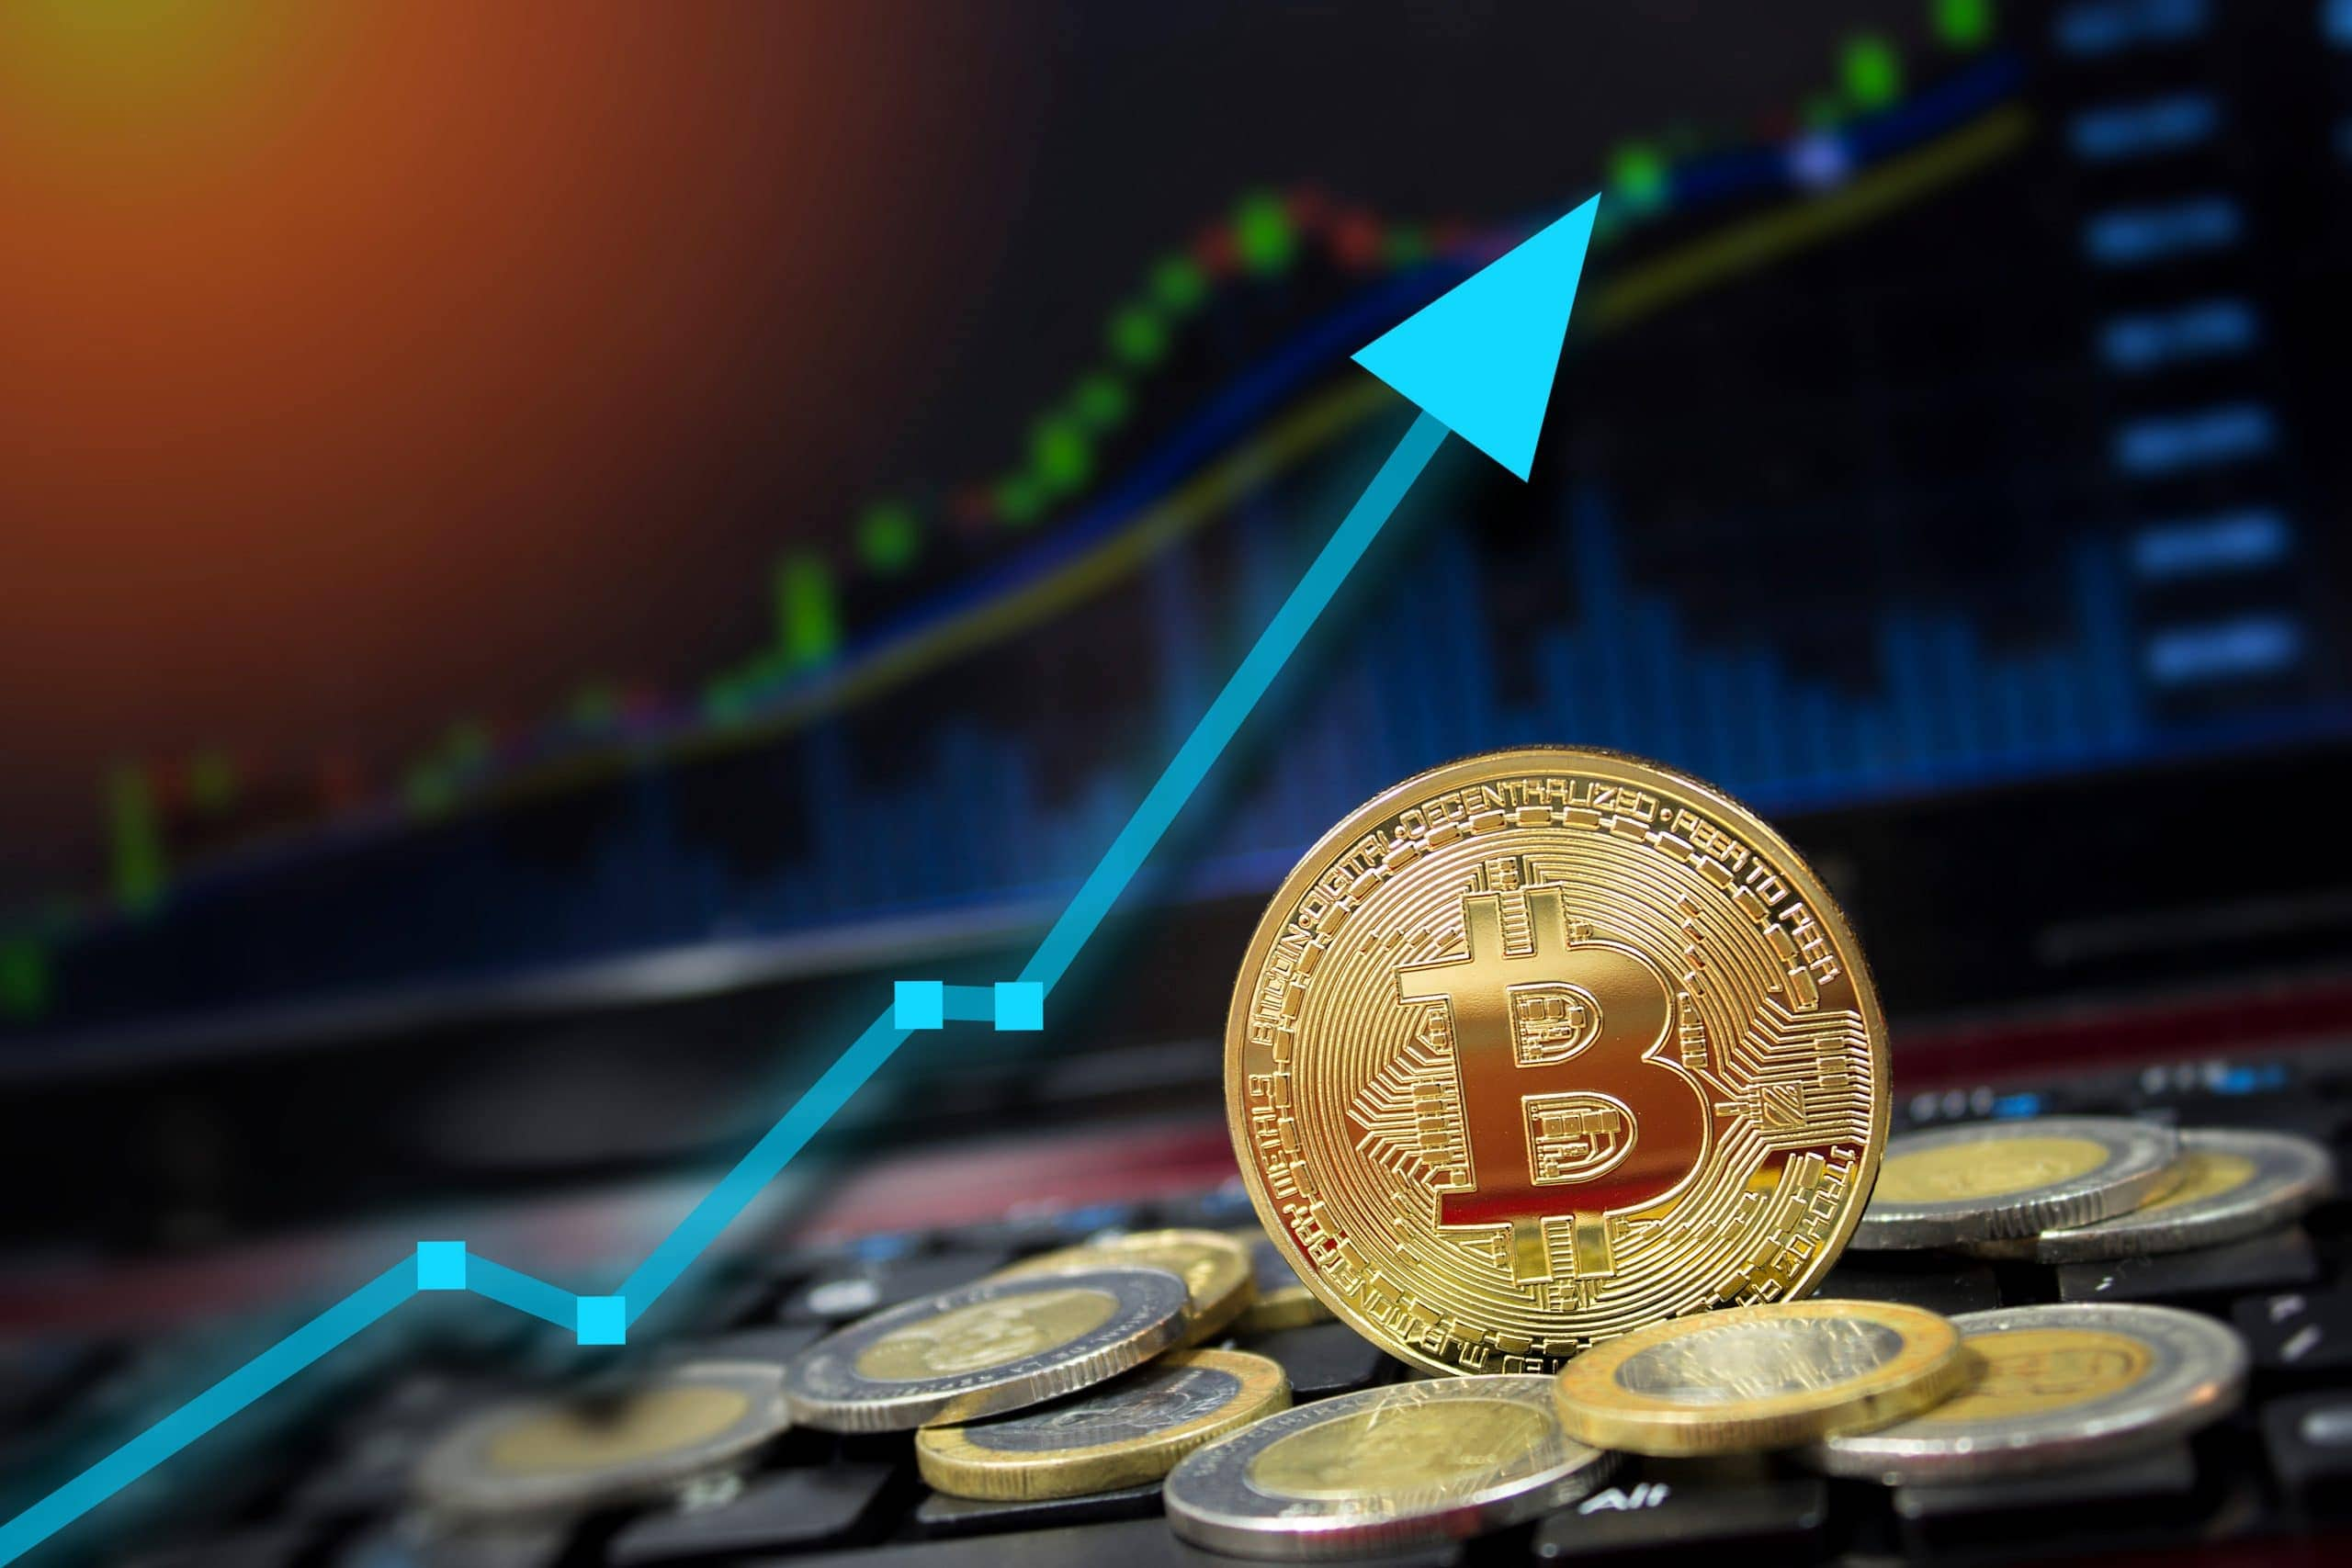 Bitcoin-Münze vor Börsenchart (Symbolbild Bitcoin-Kurs)